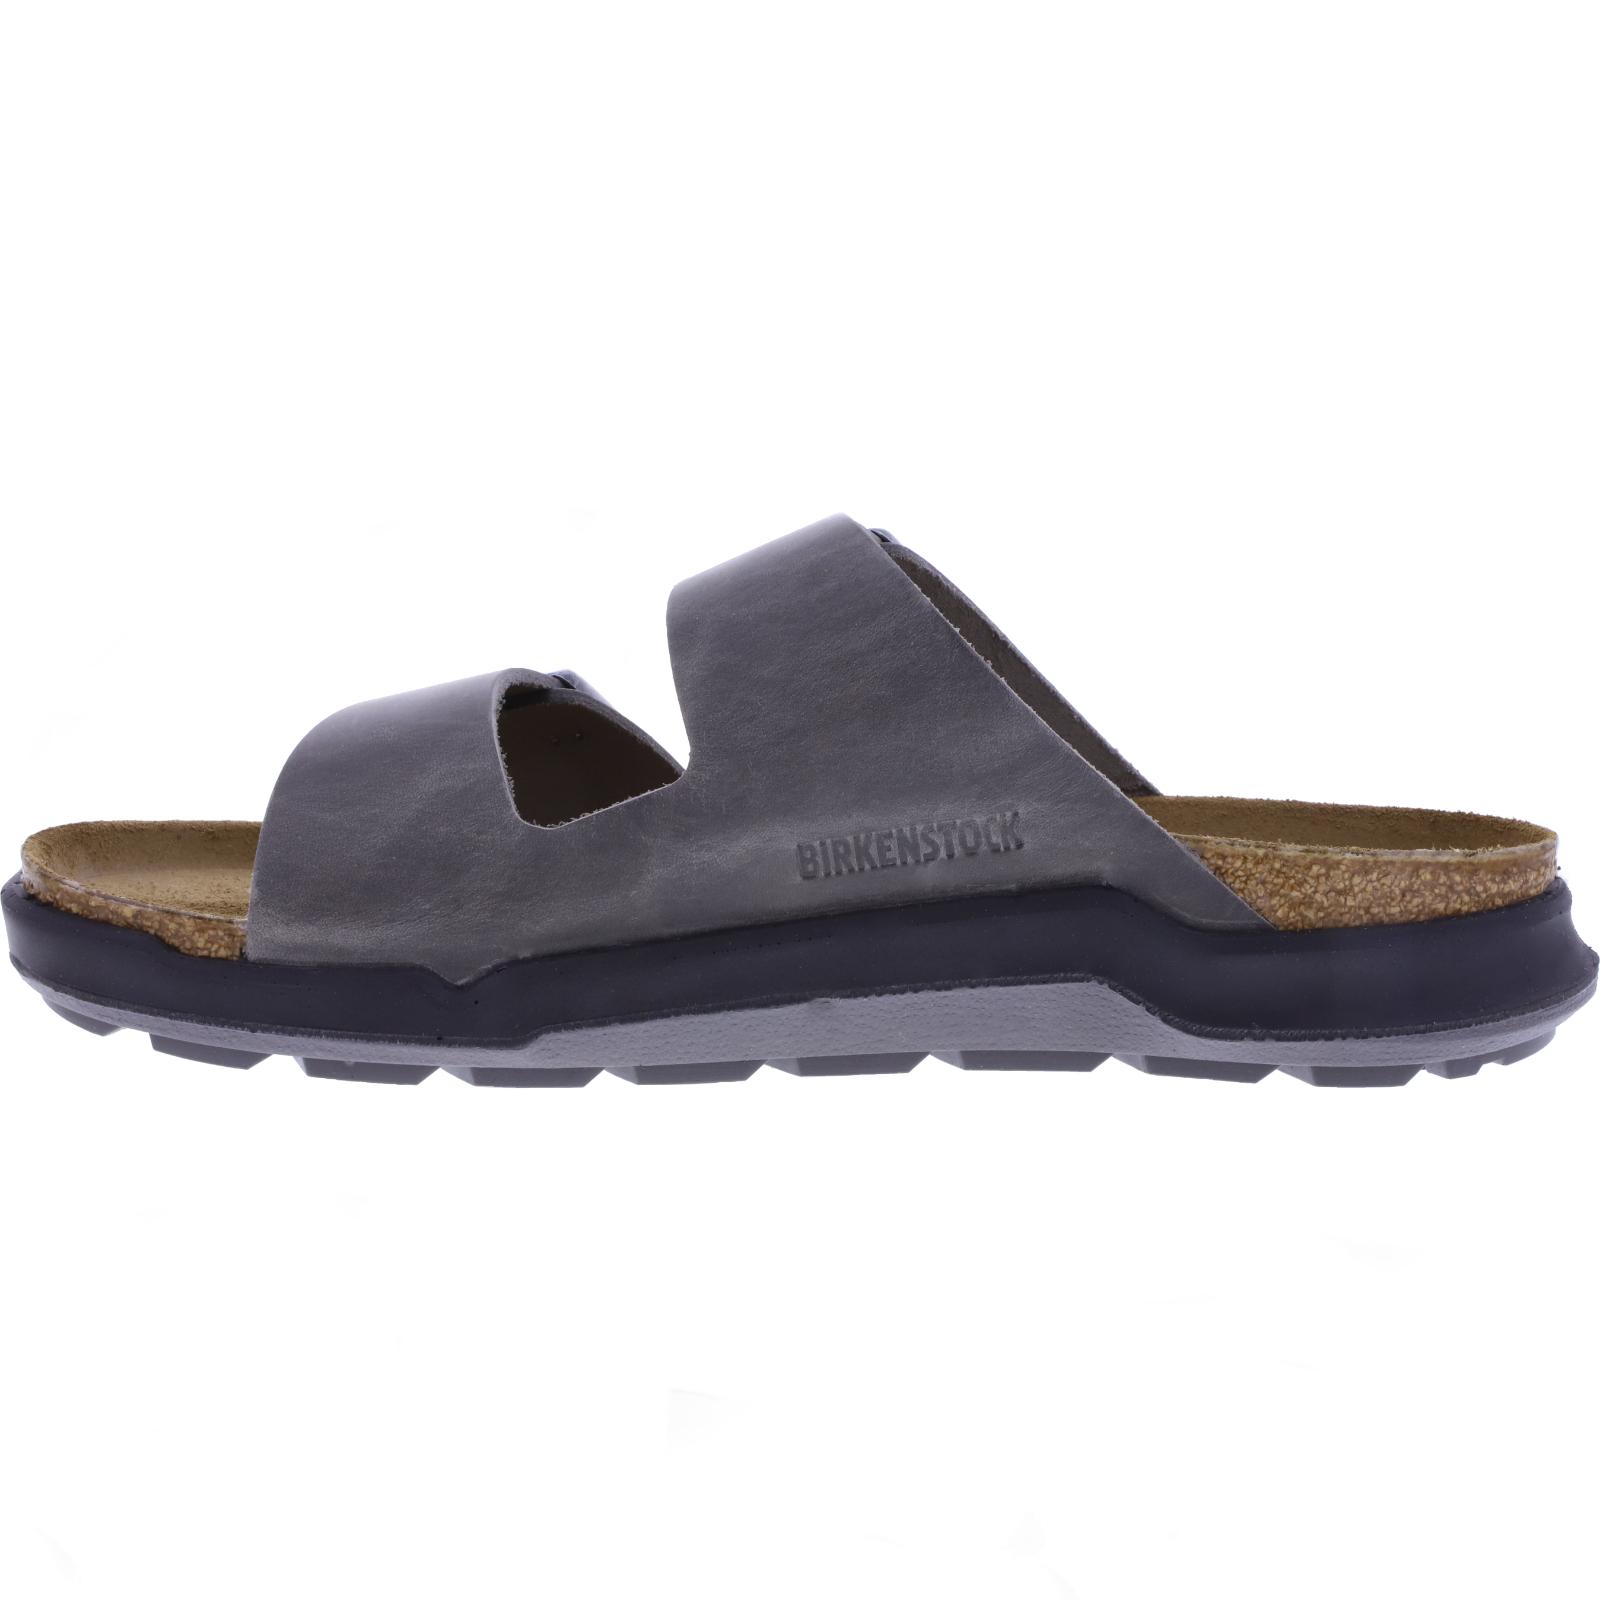 Birkenstock Crosstown Modell: Arizona CT Iron Grau Leder Weite: Normal Art: 1014950 Herren